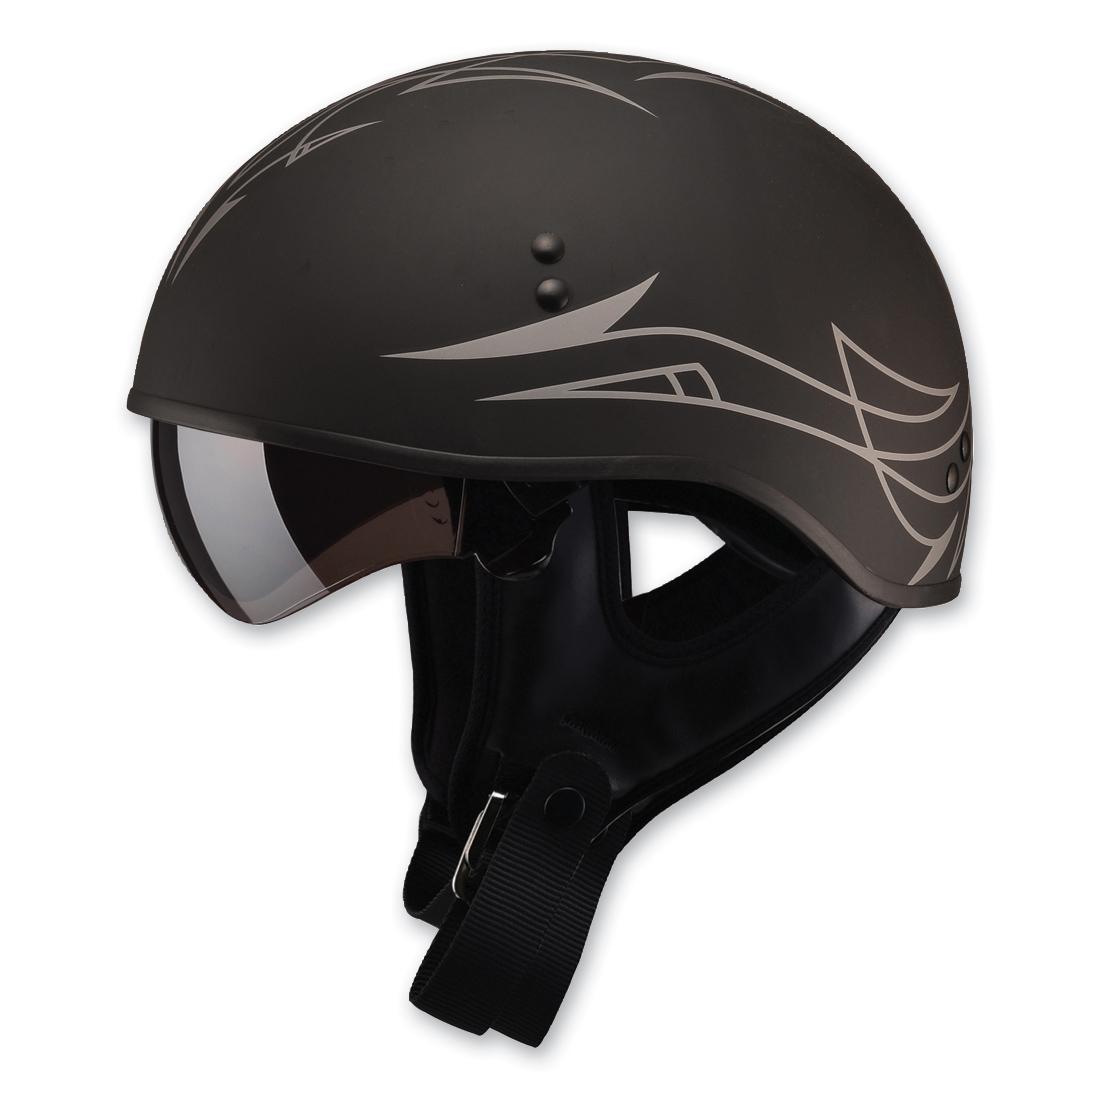 GMAX GM65 Naked Pin Flat Black/Dark Silver Half Helmet